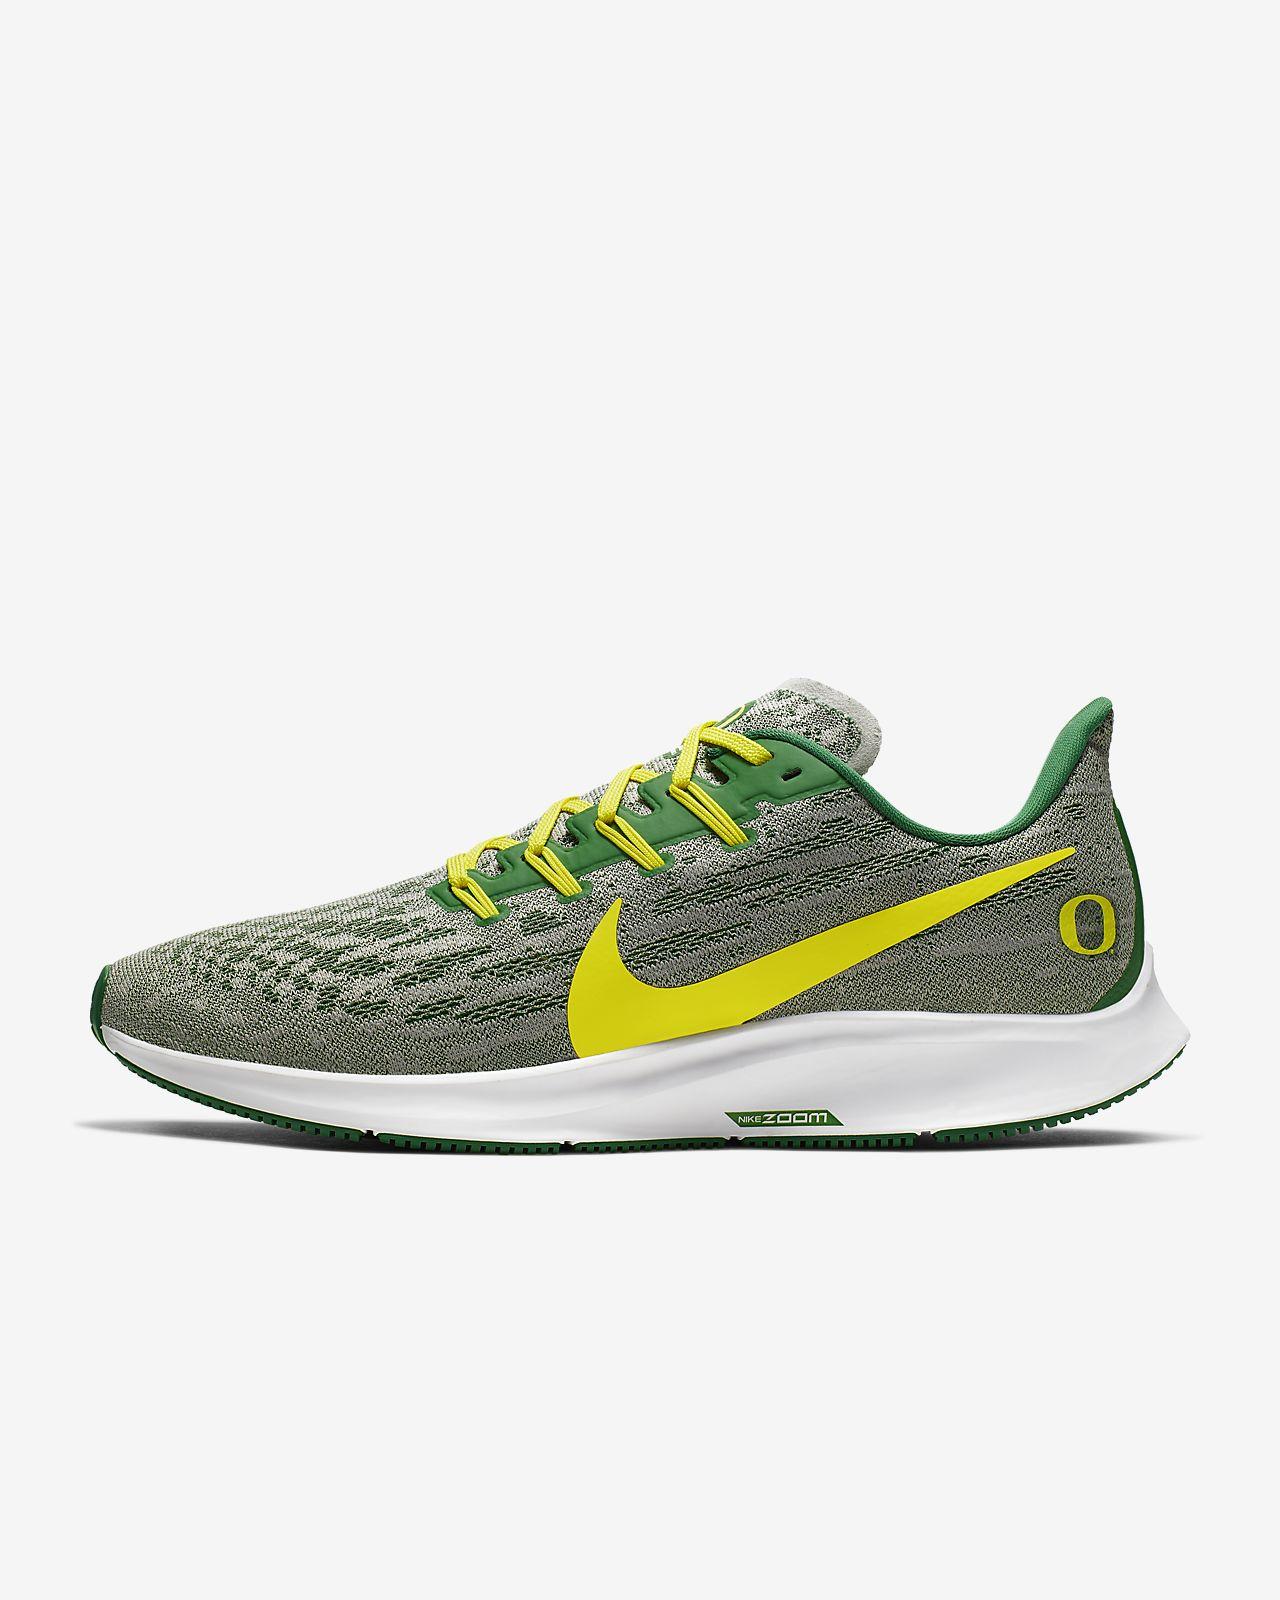 22ce439a Nike Air Zoom Pegasus 36 (Oregon) Men's Running Shoe